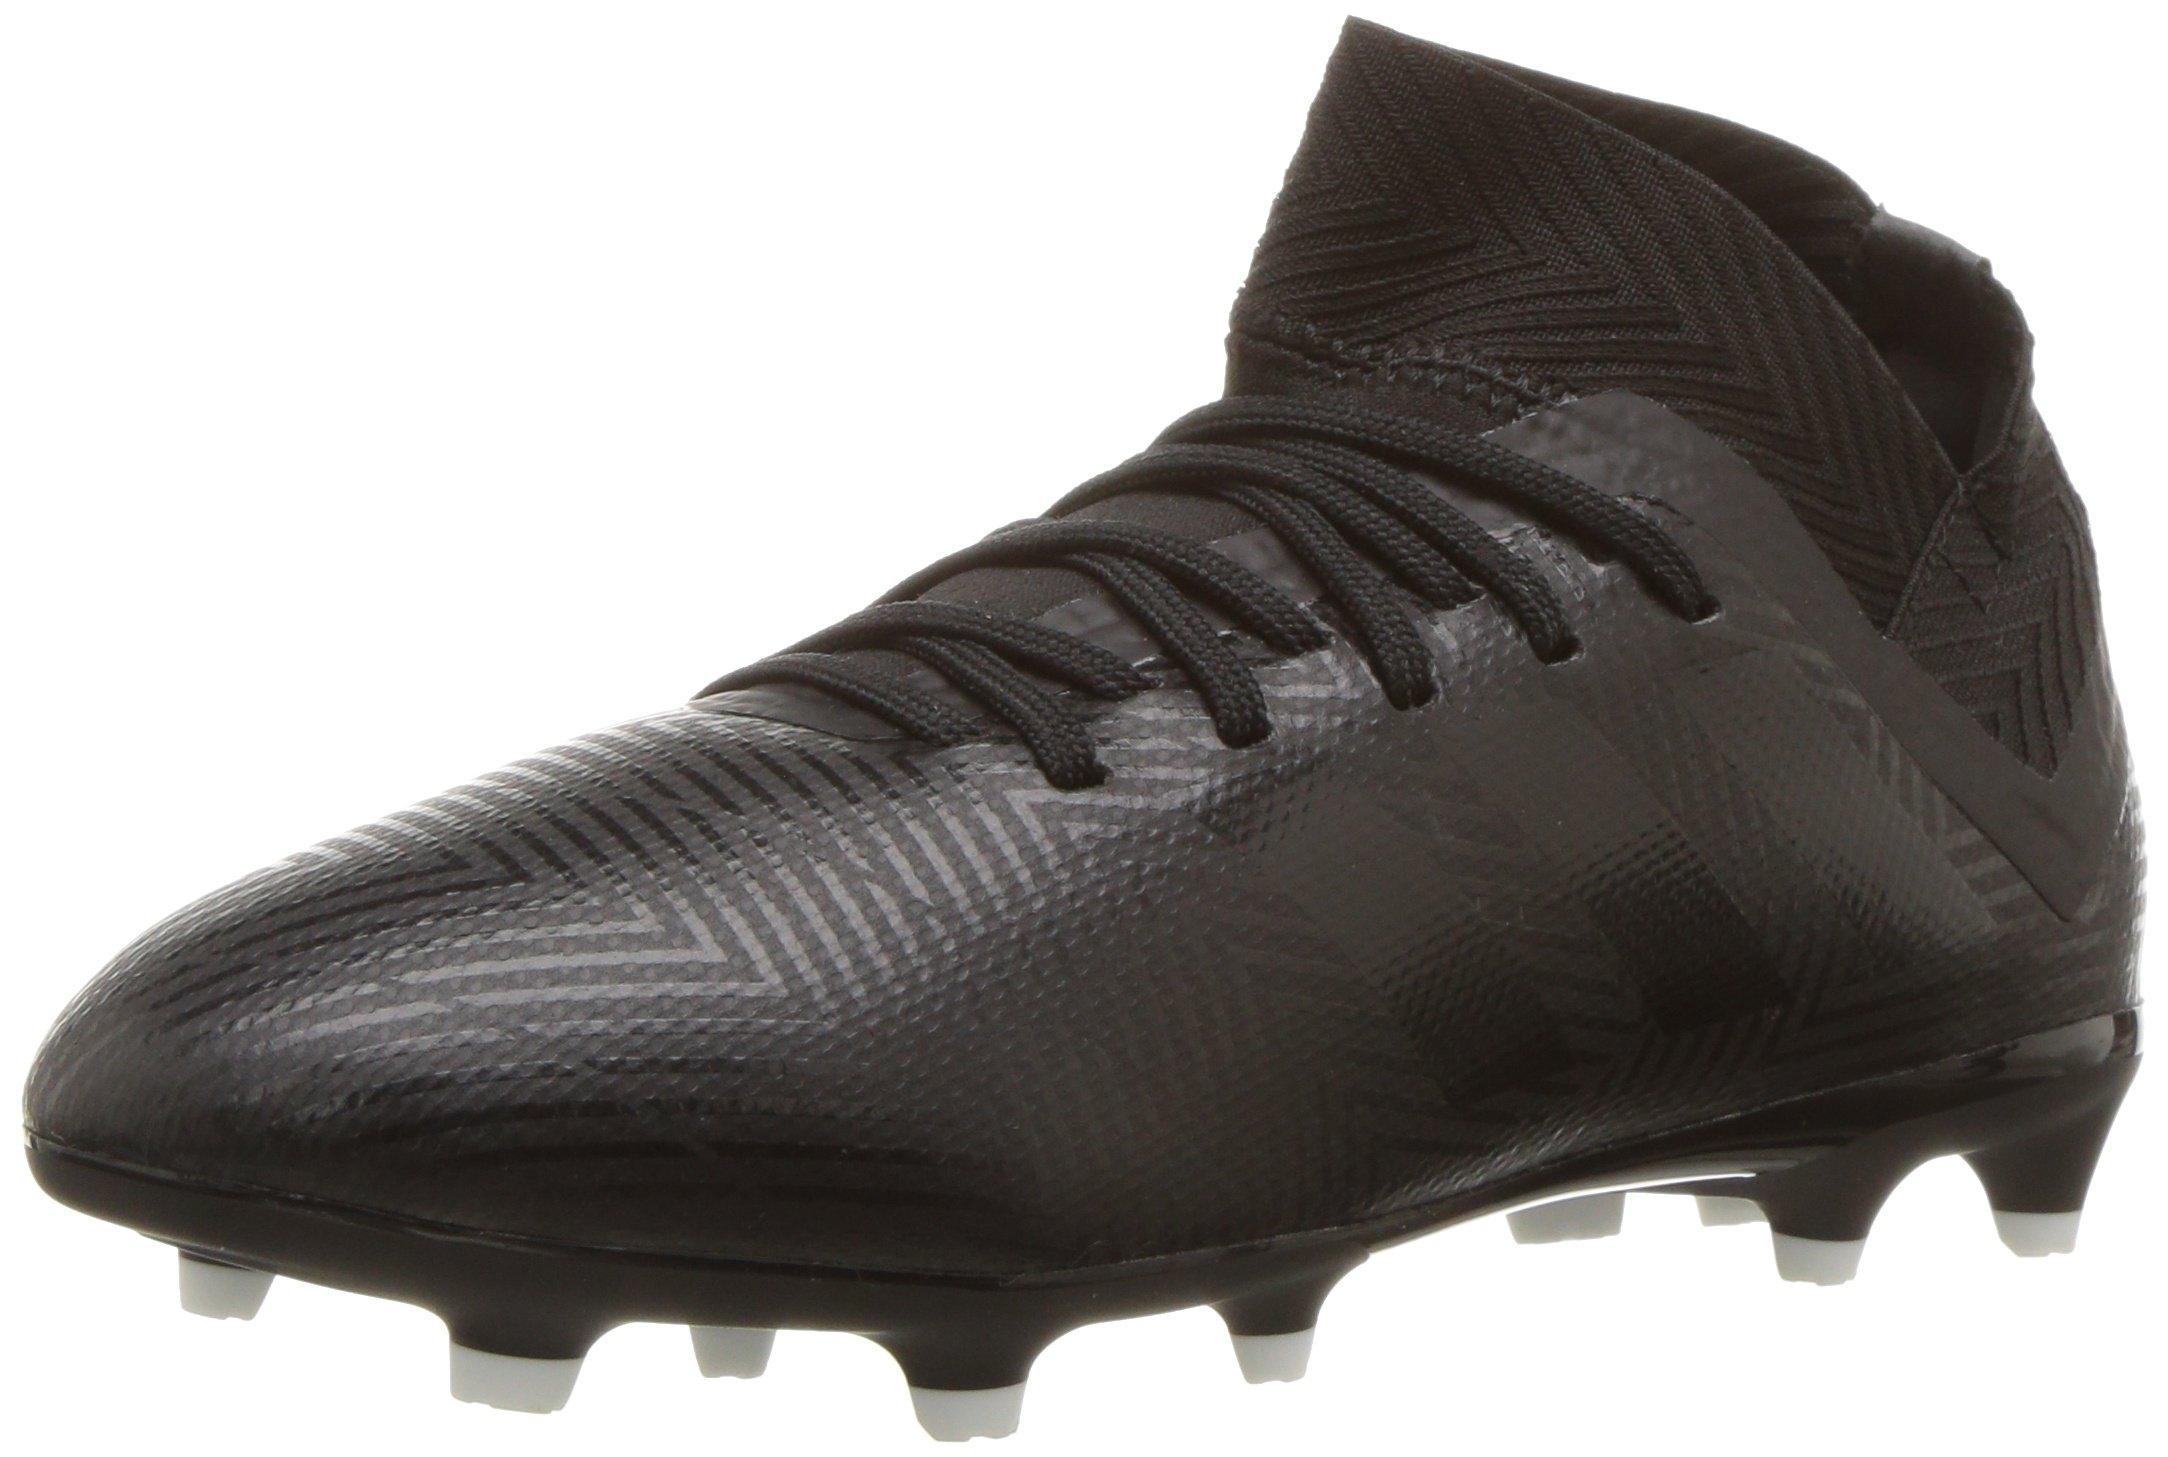 adidas Unisex Nemeziz 18.3 Firm Ground Soccer Shoe, Black/White, 1 M US Little Kid